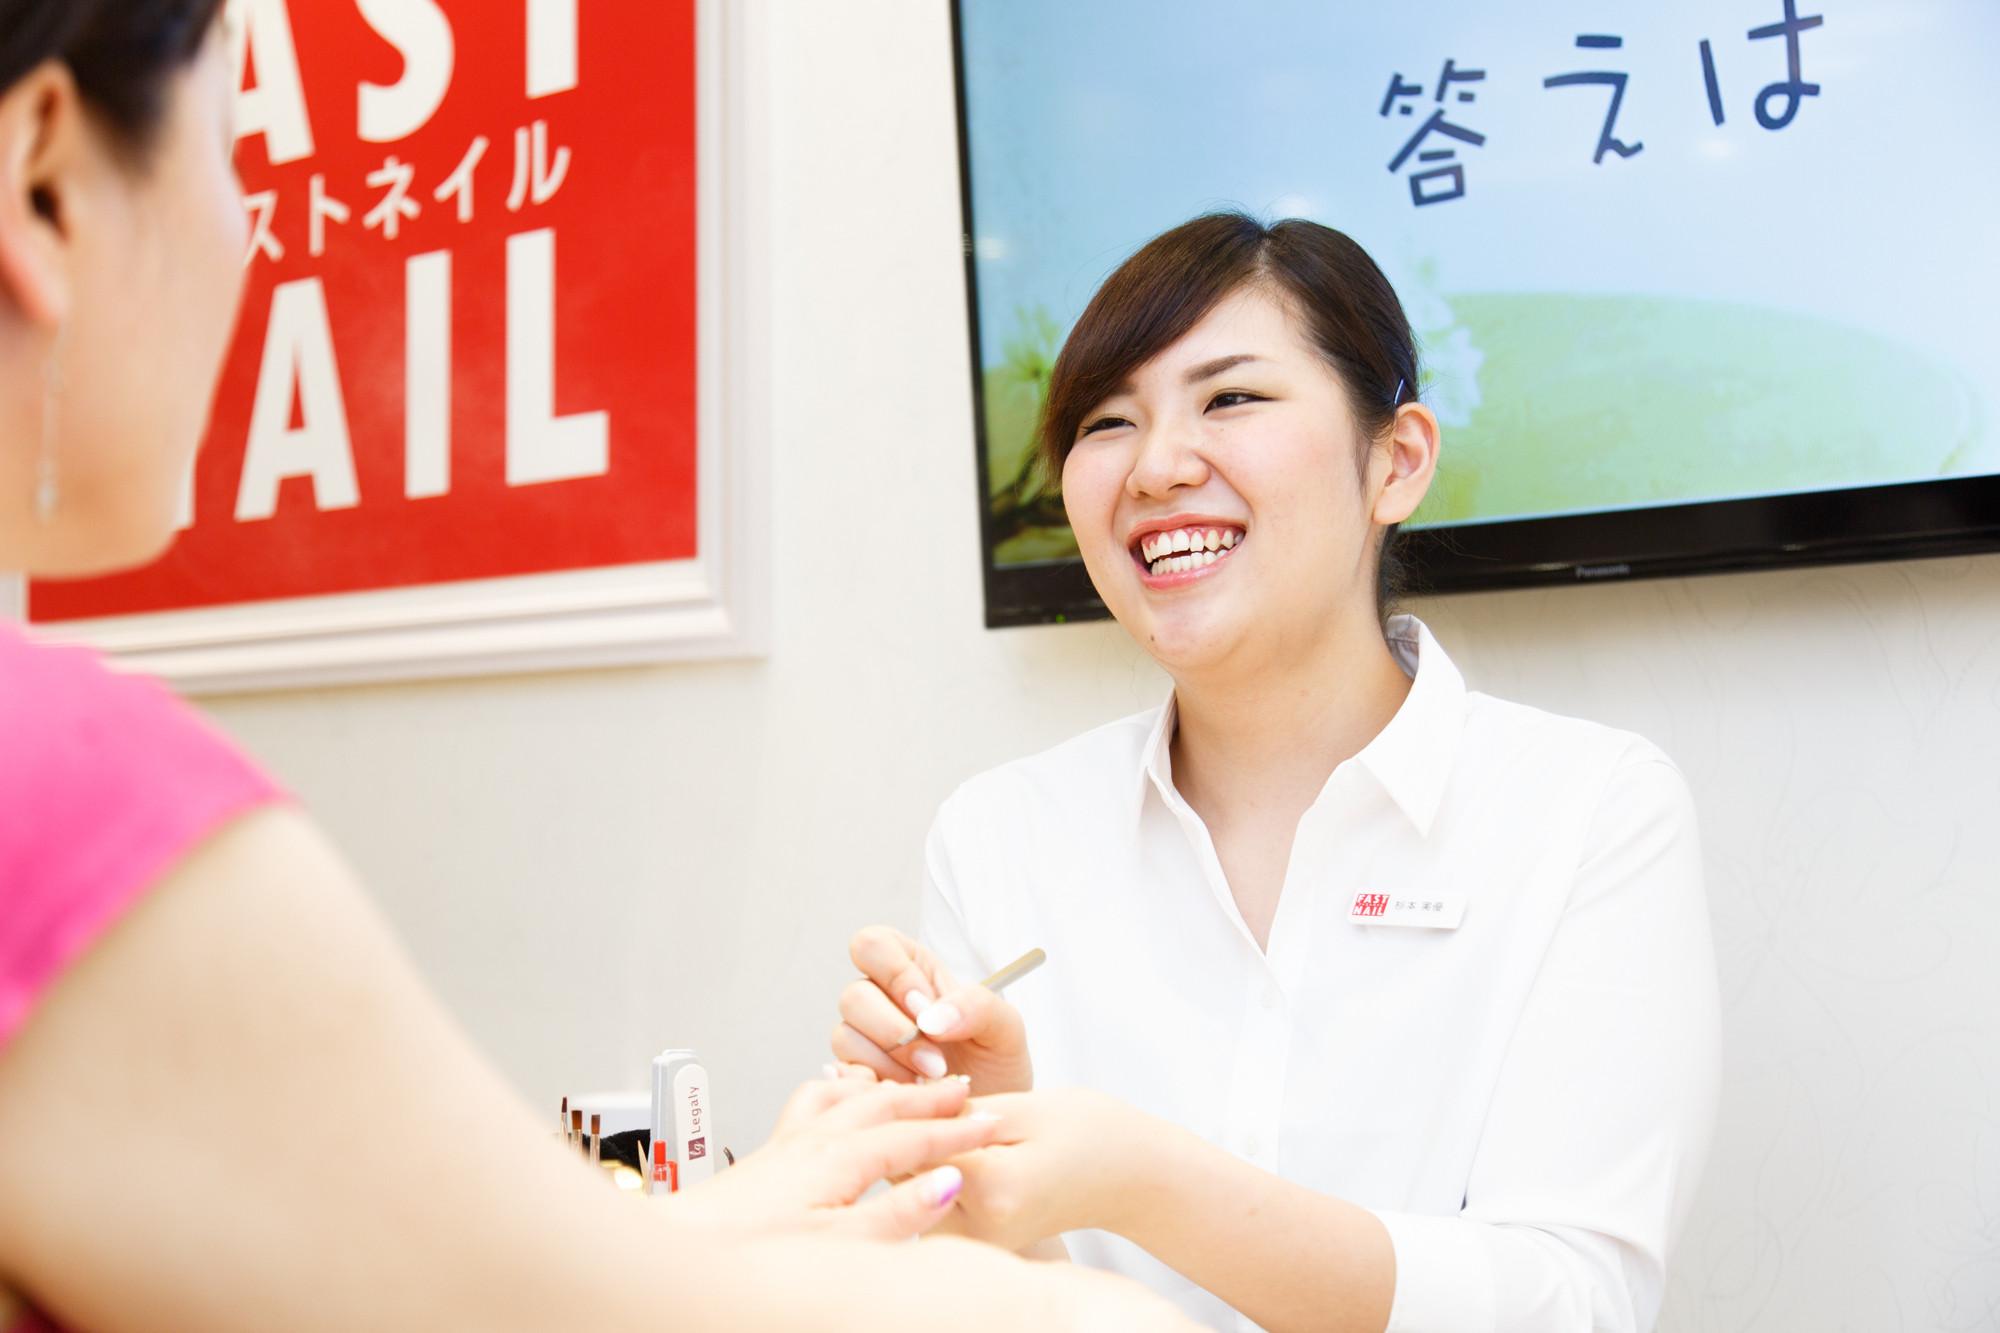 FASTNAIL(ファストネイル) 吉祥寺店 のアルバイト情報